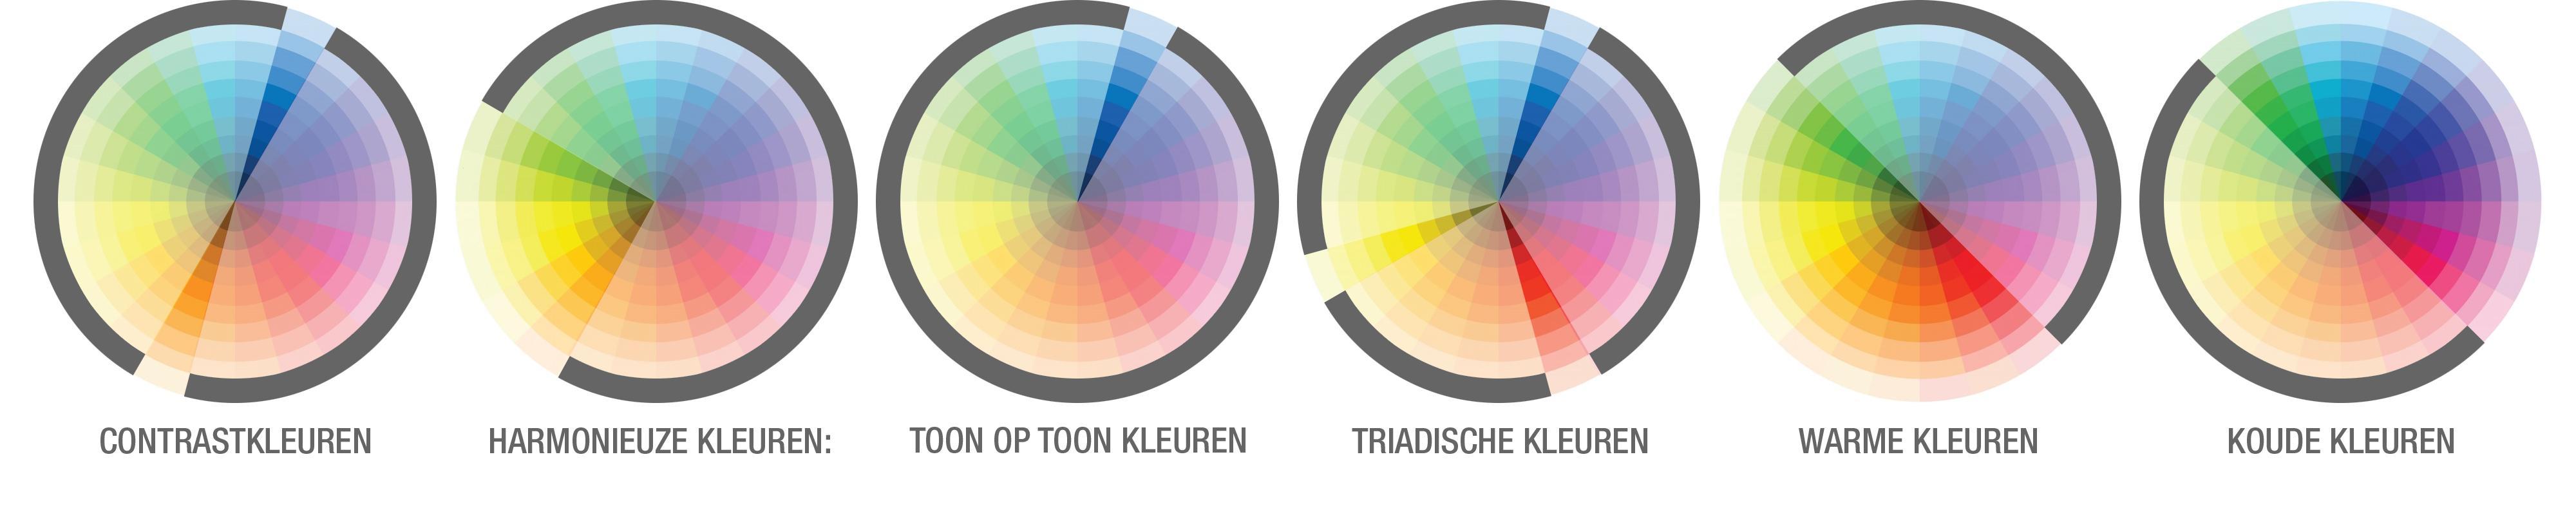 kleurencirkel ShopX